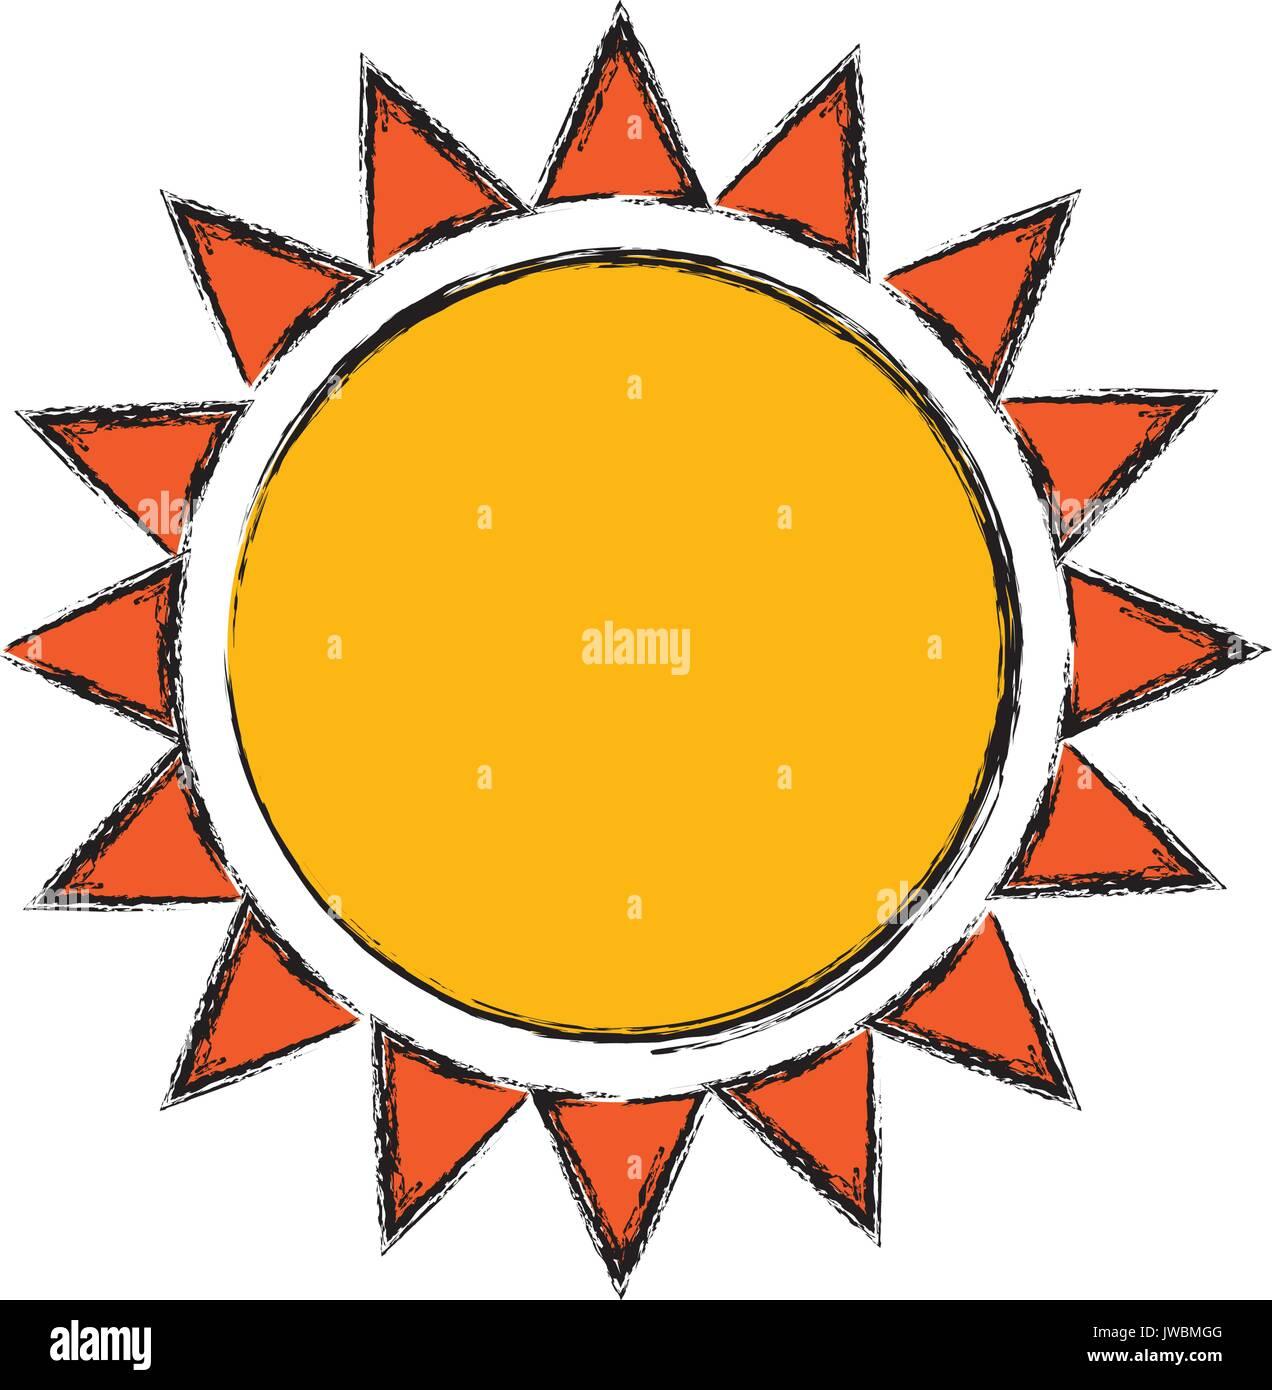 Sun icon image Stockbild